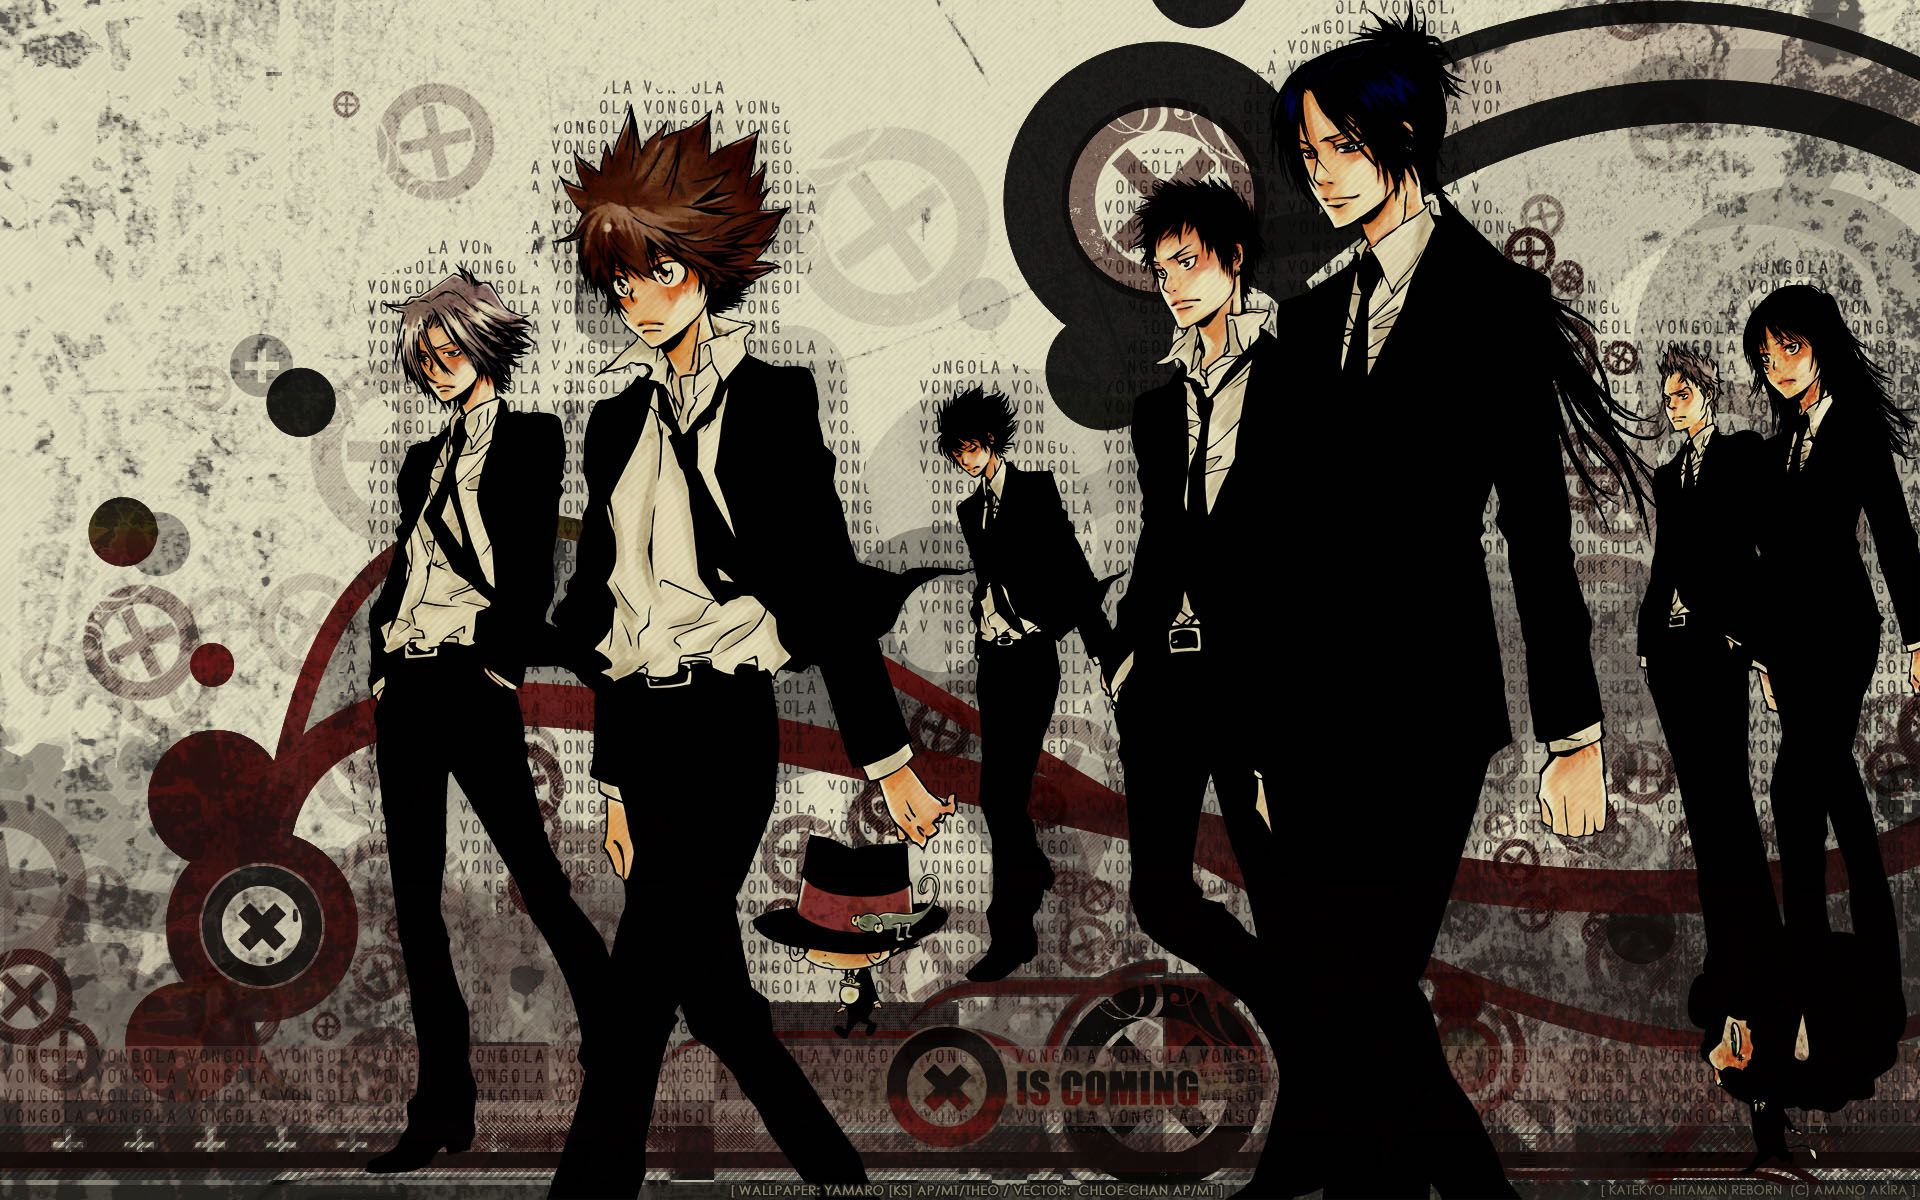 Anime Katekyo Hitman Reborn Anime Wallpaper